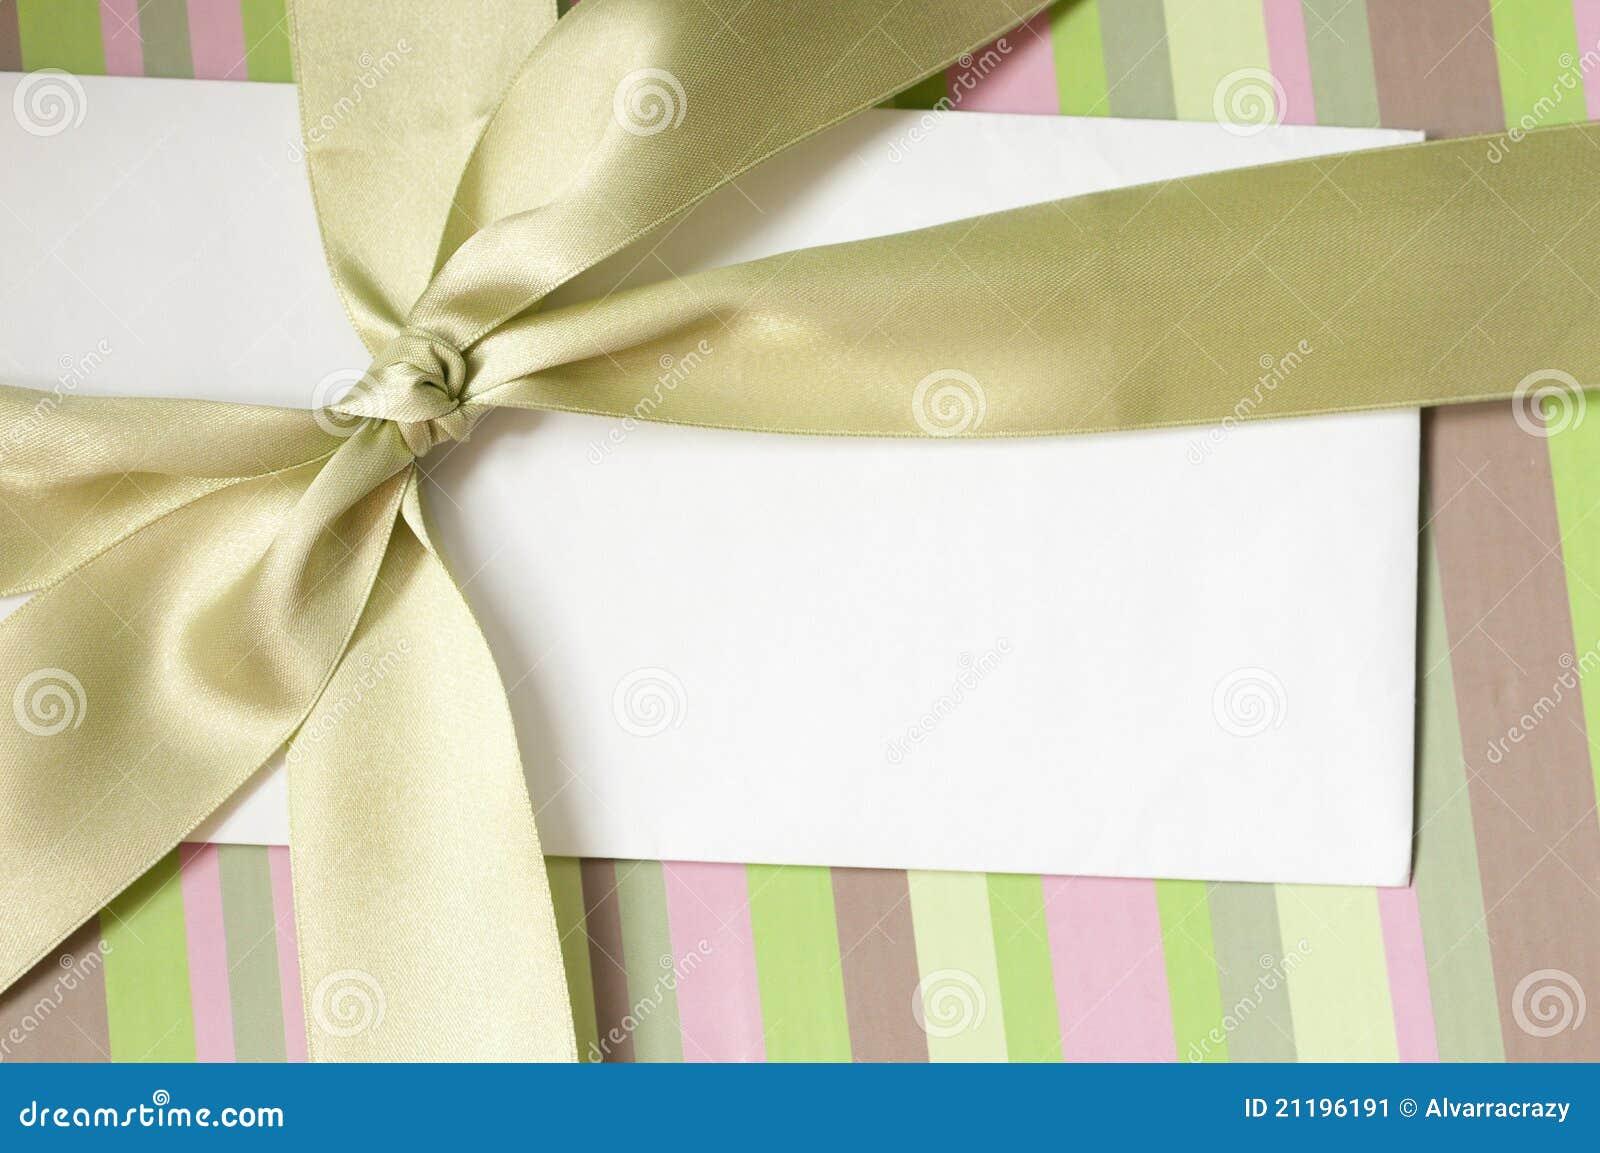 Blank envelope on the gift box